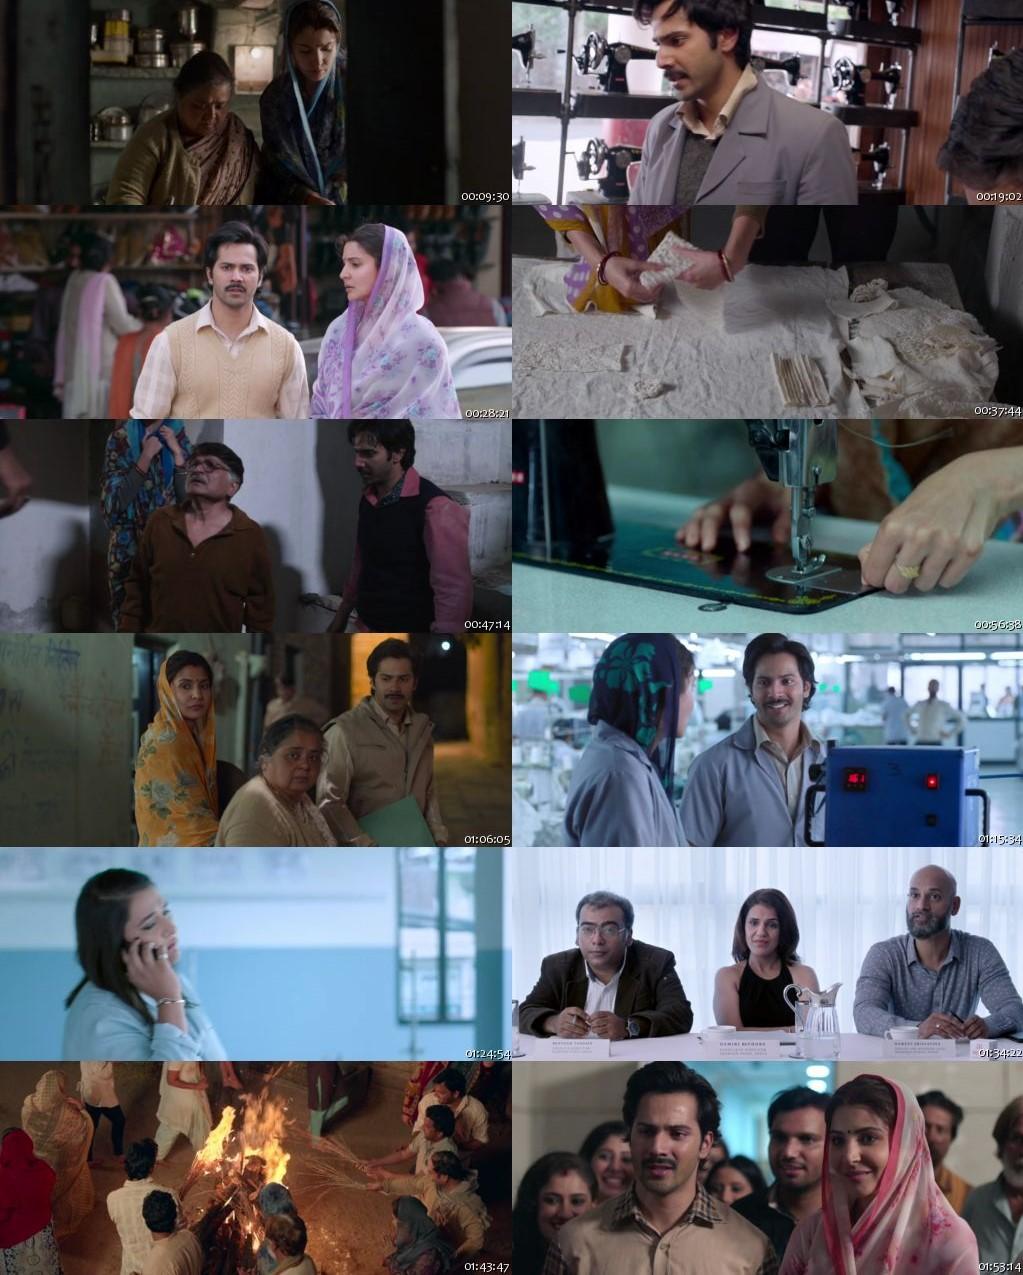 Sui Dhaaga: Made in India 2018 Full Hindi Movie Online Watch BRRip 720p